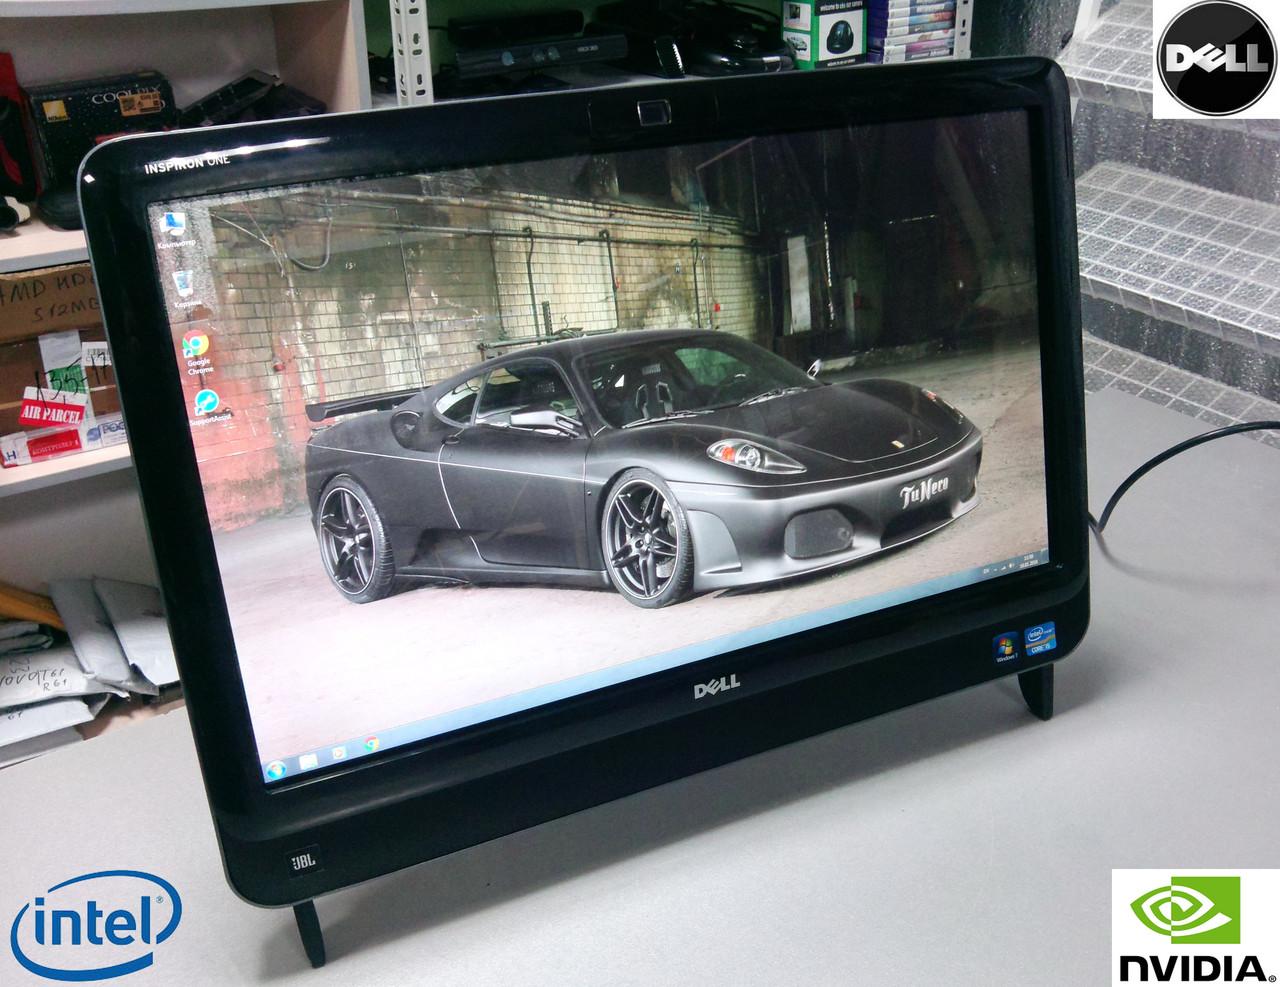 "Моноблок Dell Inspiron One 2320 Intel Core i5/RAM 8Gb/HDD 500Gb/Video 1Gb/23"" Full HD/Touch-Screen"